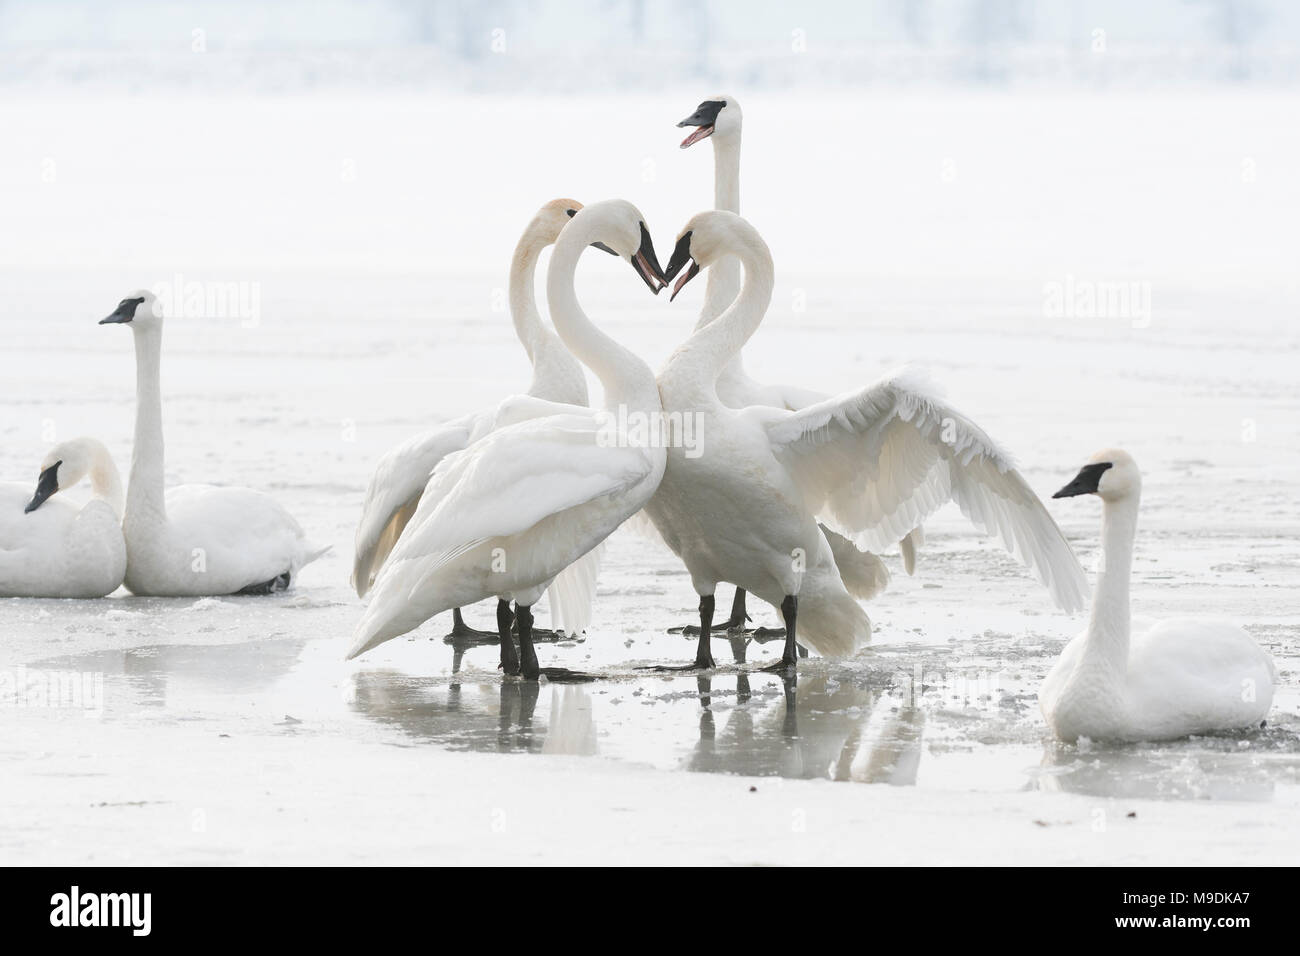 Trumpeter Swans (Cygnus buccinator), territoriale Posieren, St. Croix River, WI, USA, Mitte Januar, von Dominique Braud/Dembinsky Foto Assoc Stockbild